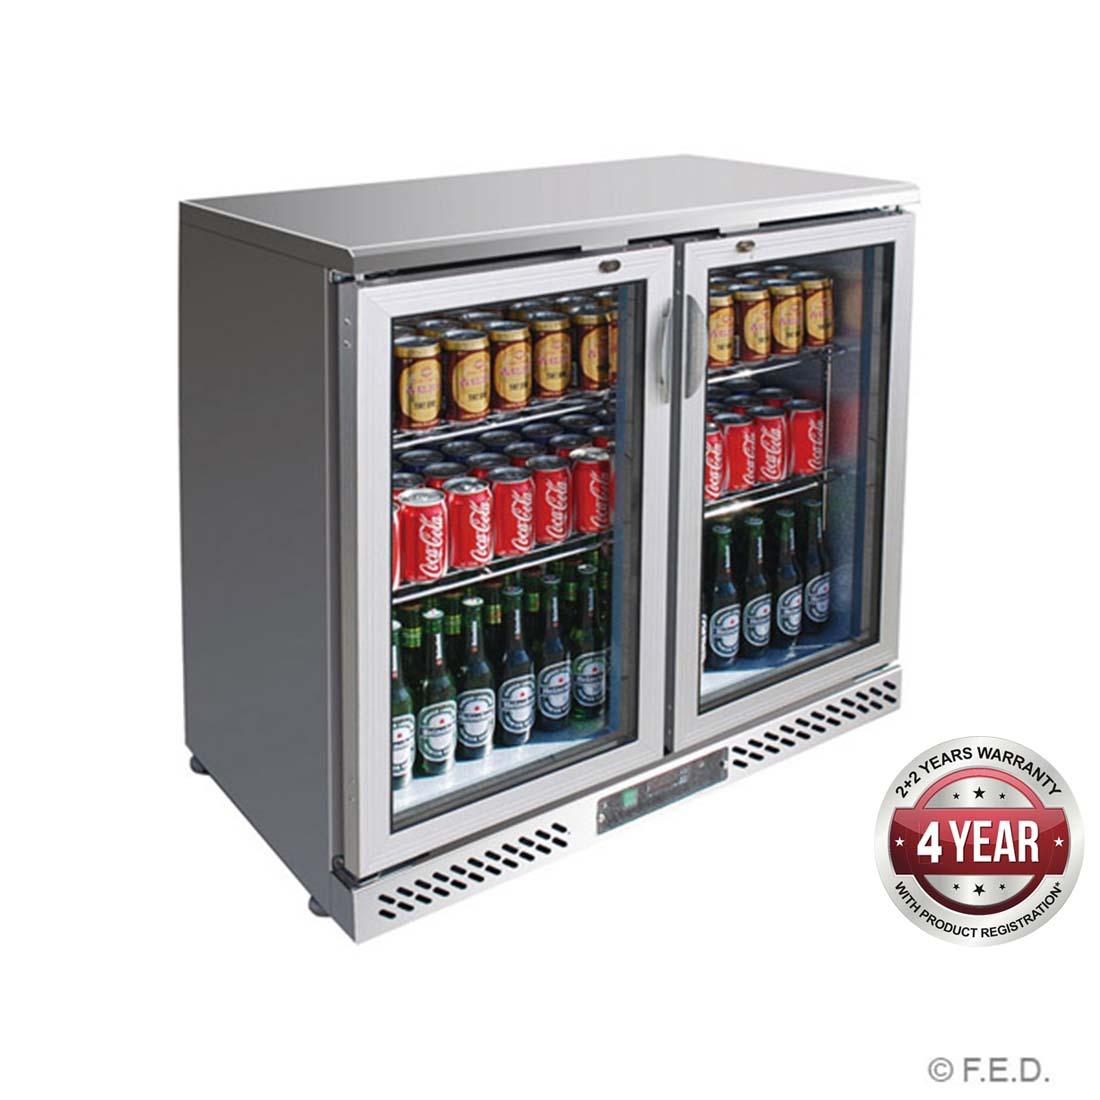 SC248SG Two Door Stainless Steel Bar Cooler